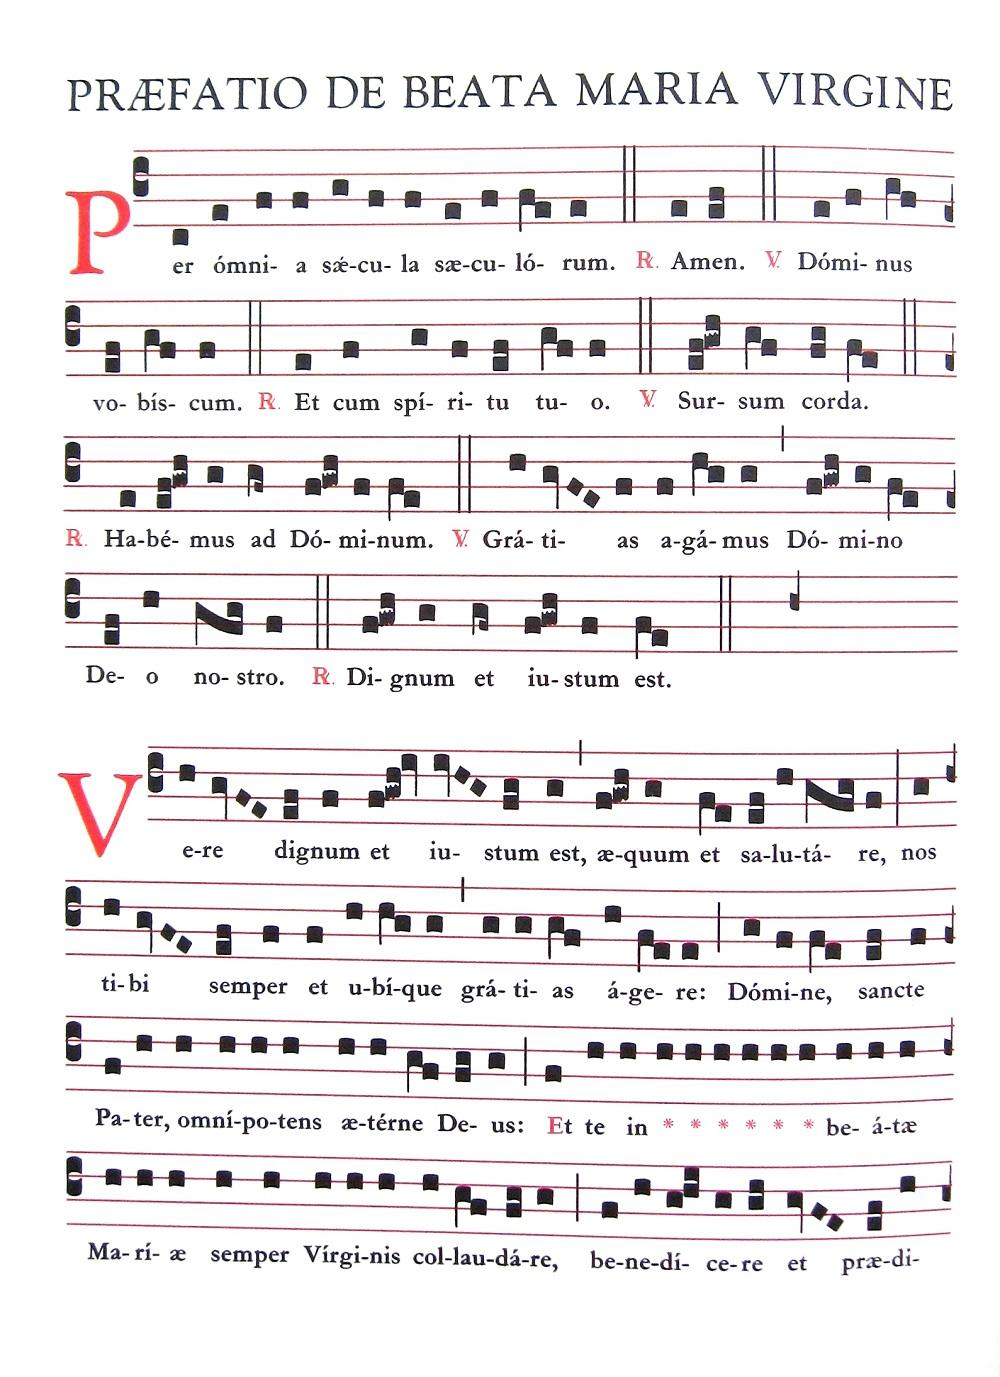 Praefatio de Beata Maria Virgine - Praefatio in tono solemniori neumy